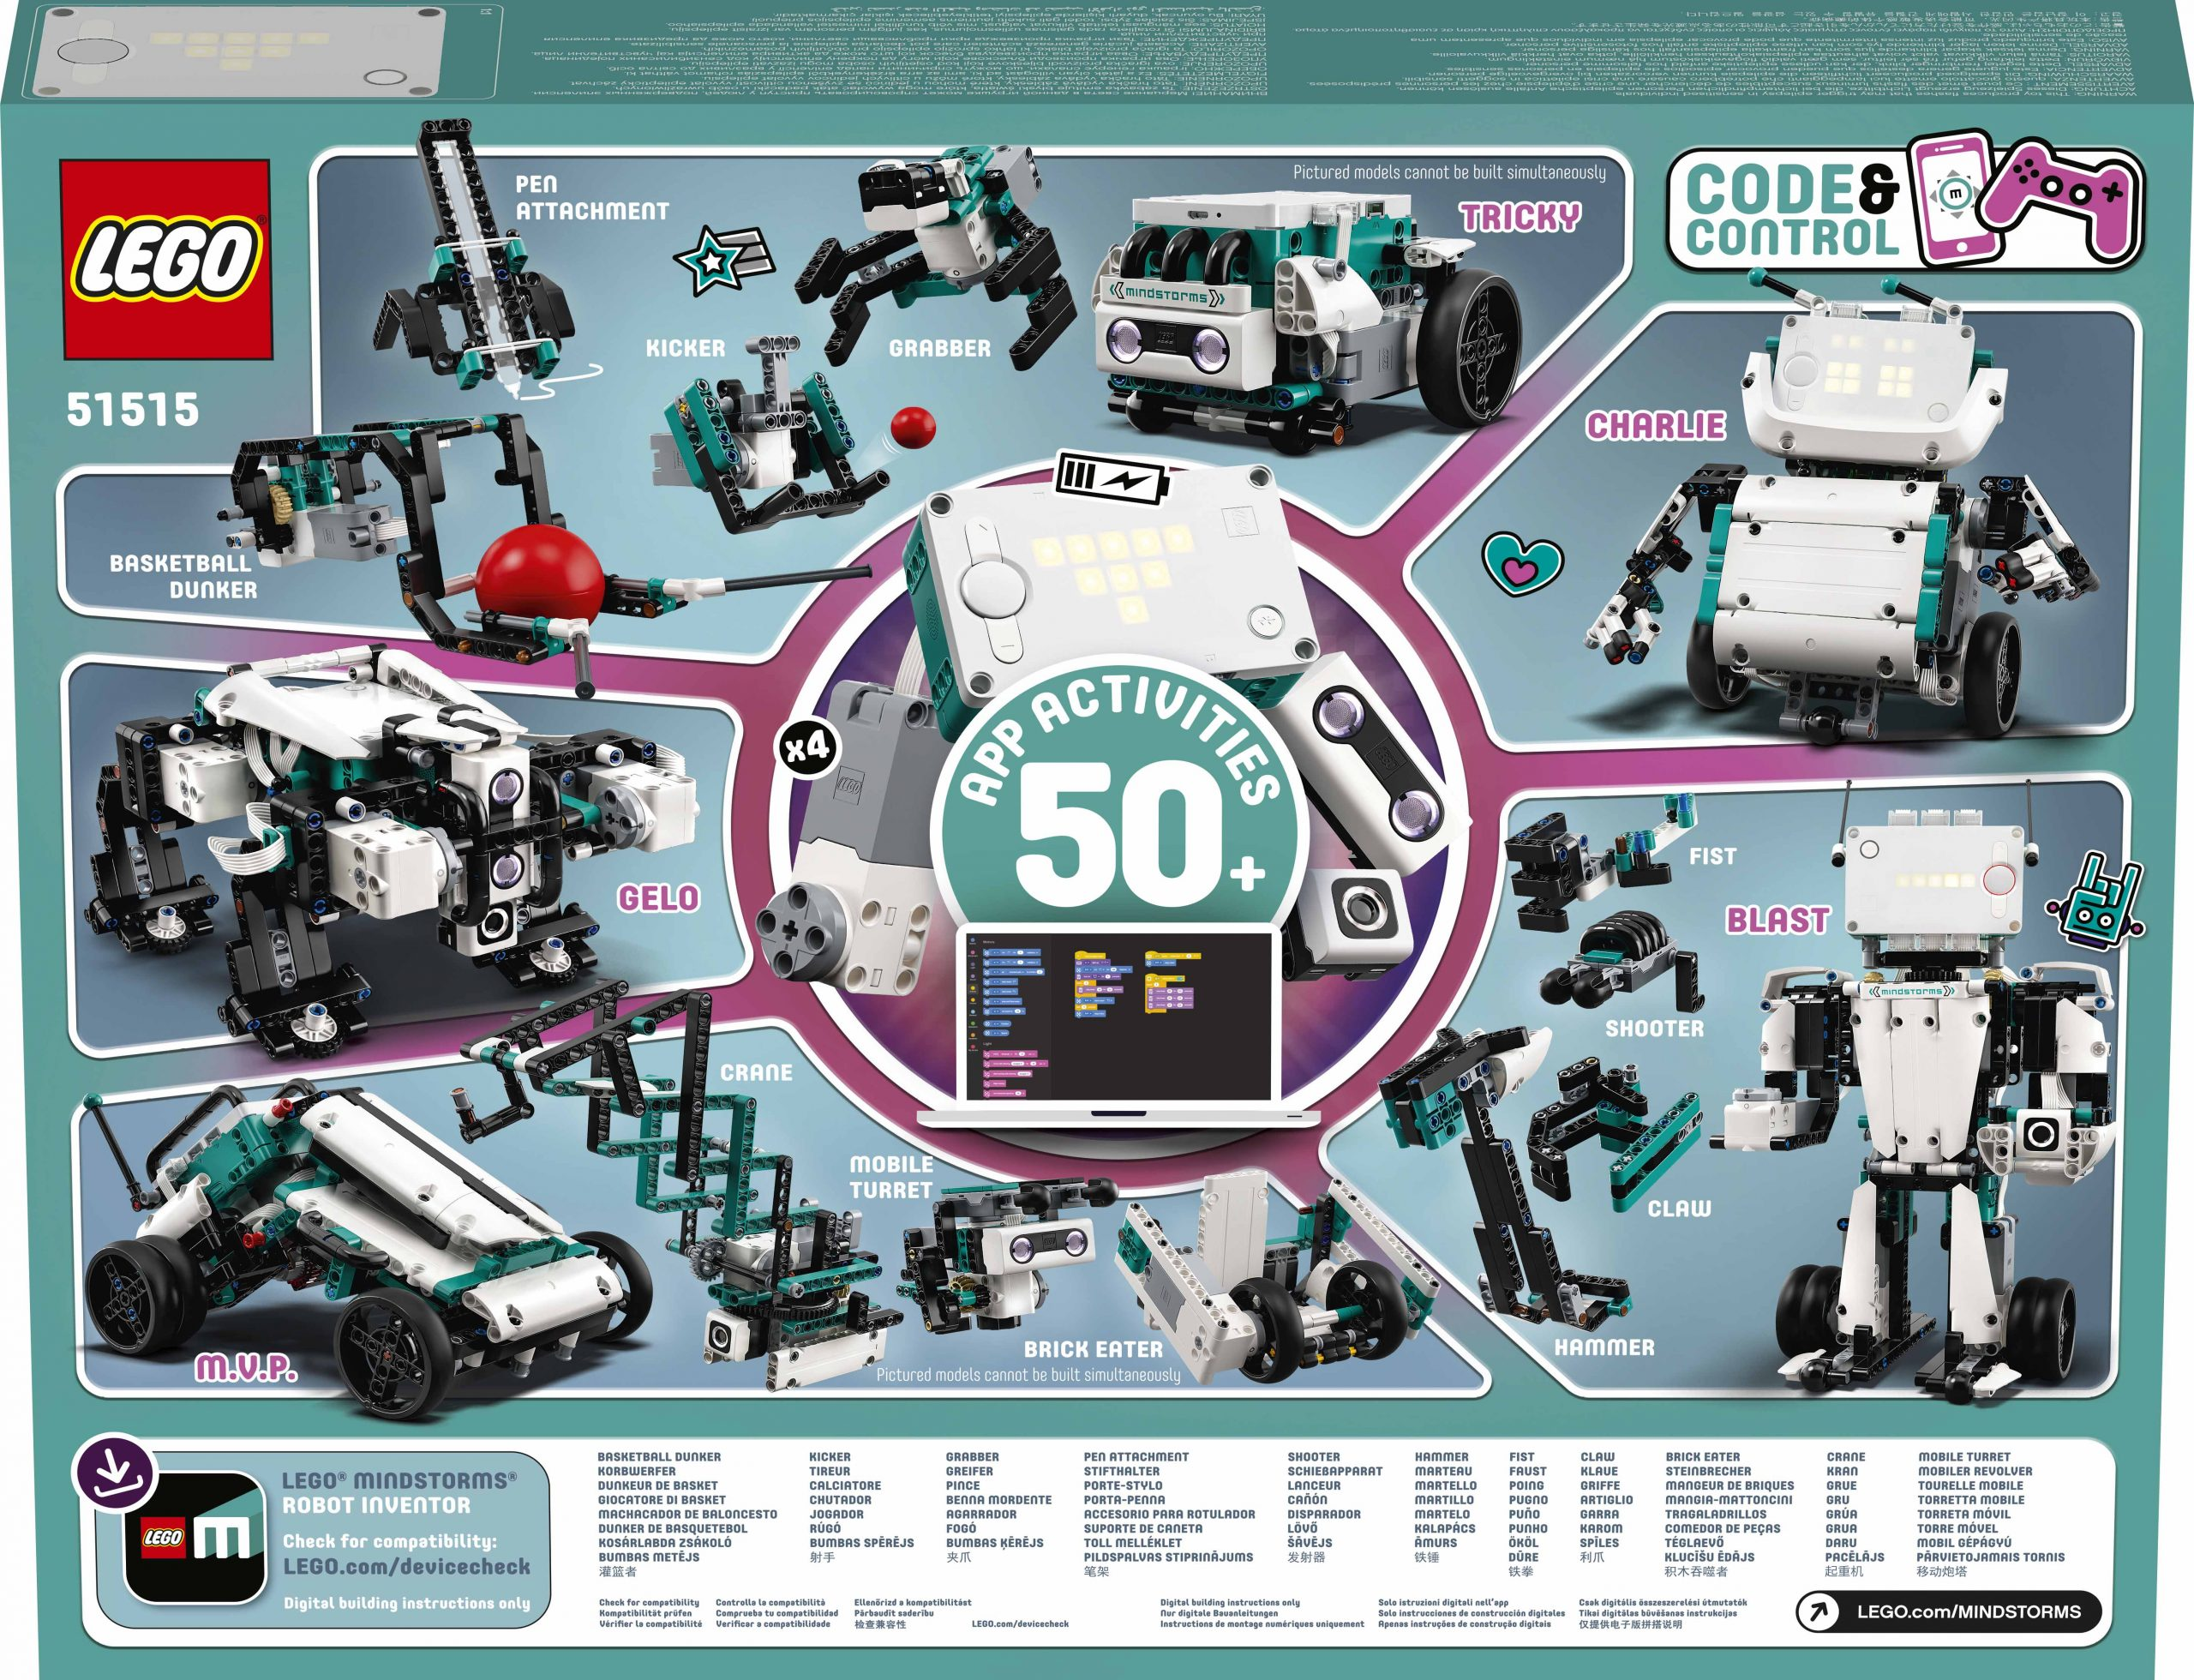 LEGO-MINDSTORMS-Robot-Inventor-51515-2-s